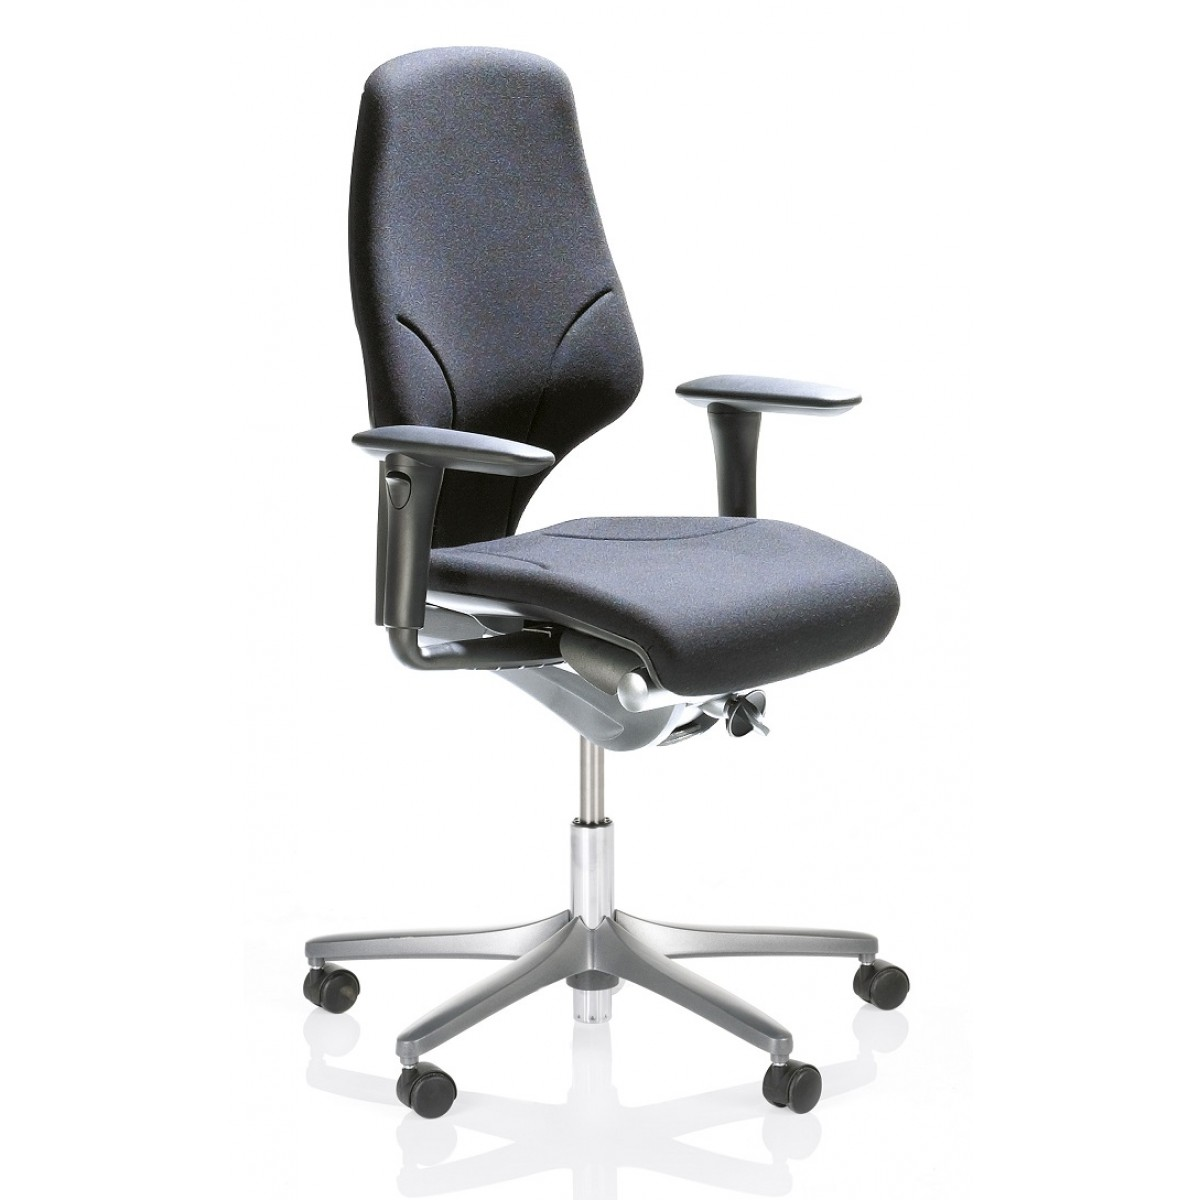 g64 7578 high back task chair